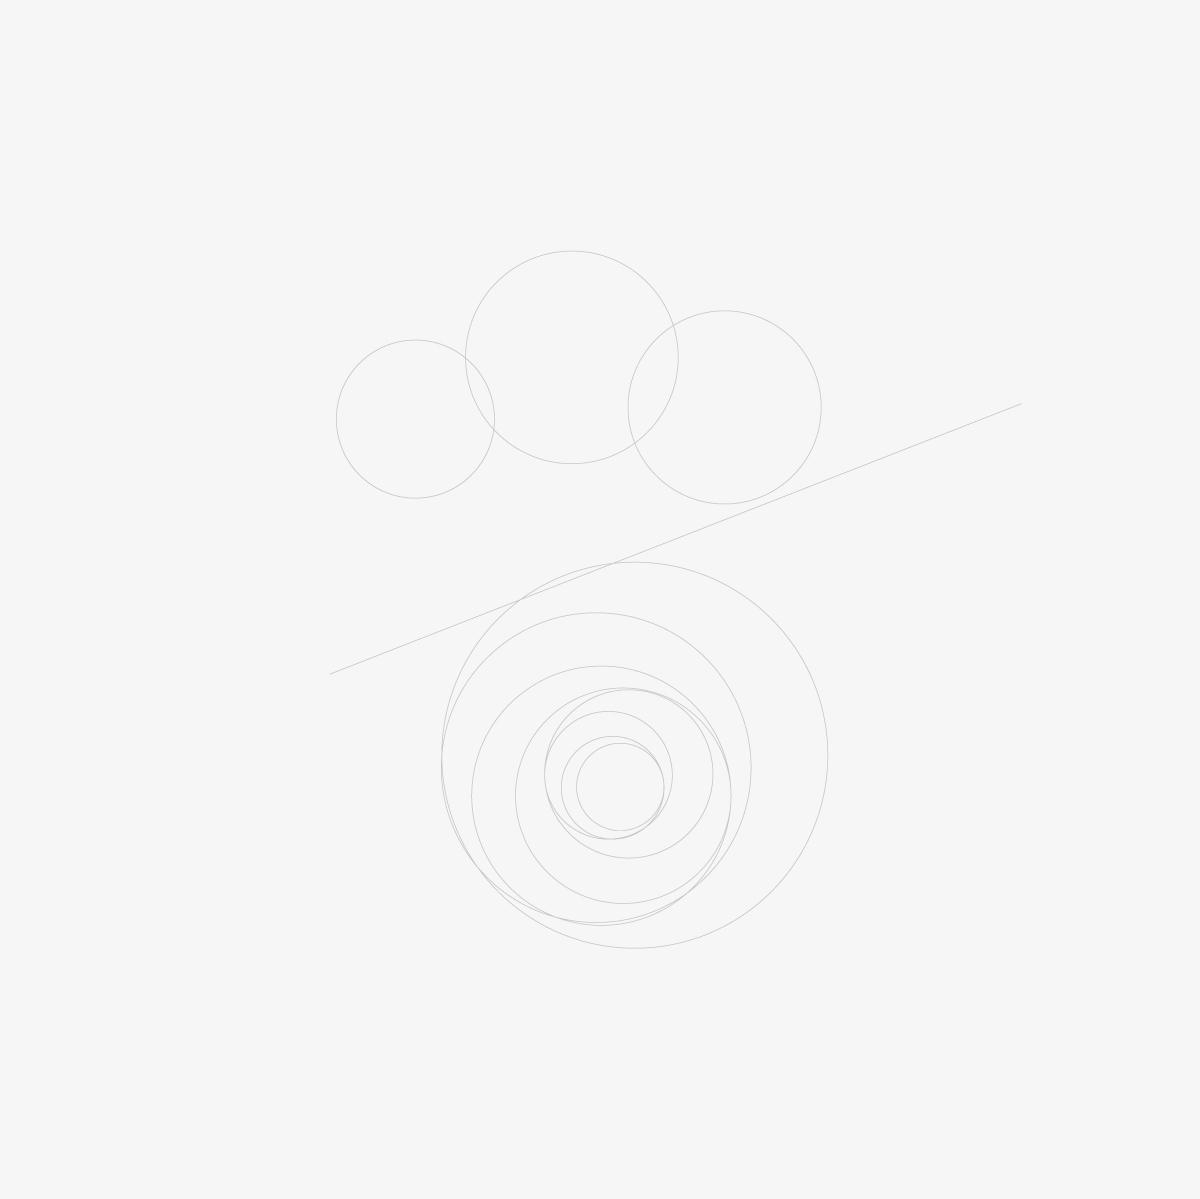 https://www.orlandinifrancesco.com/wp/wp-content/uploads/2019/02/Rest-Around-Logo-1.jpg